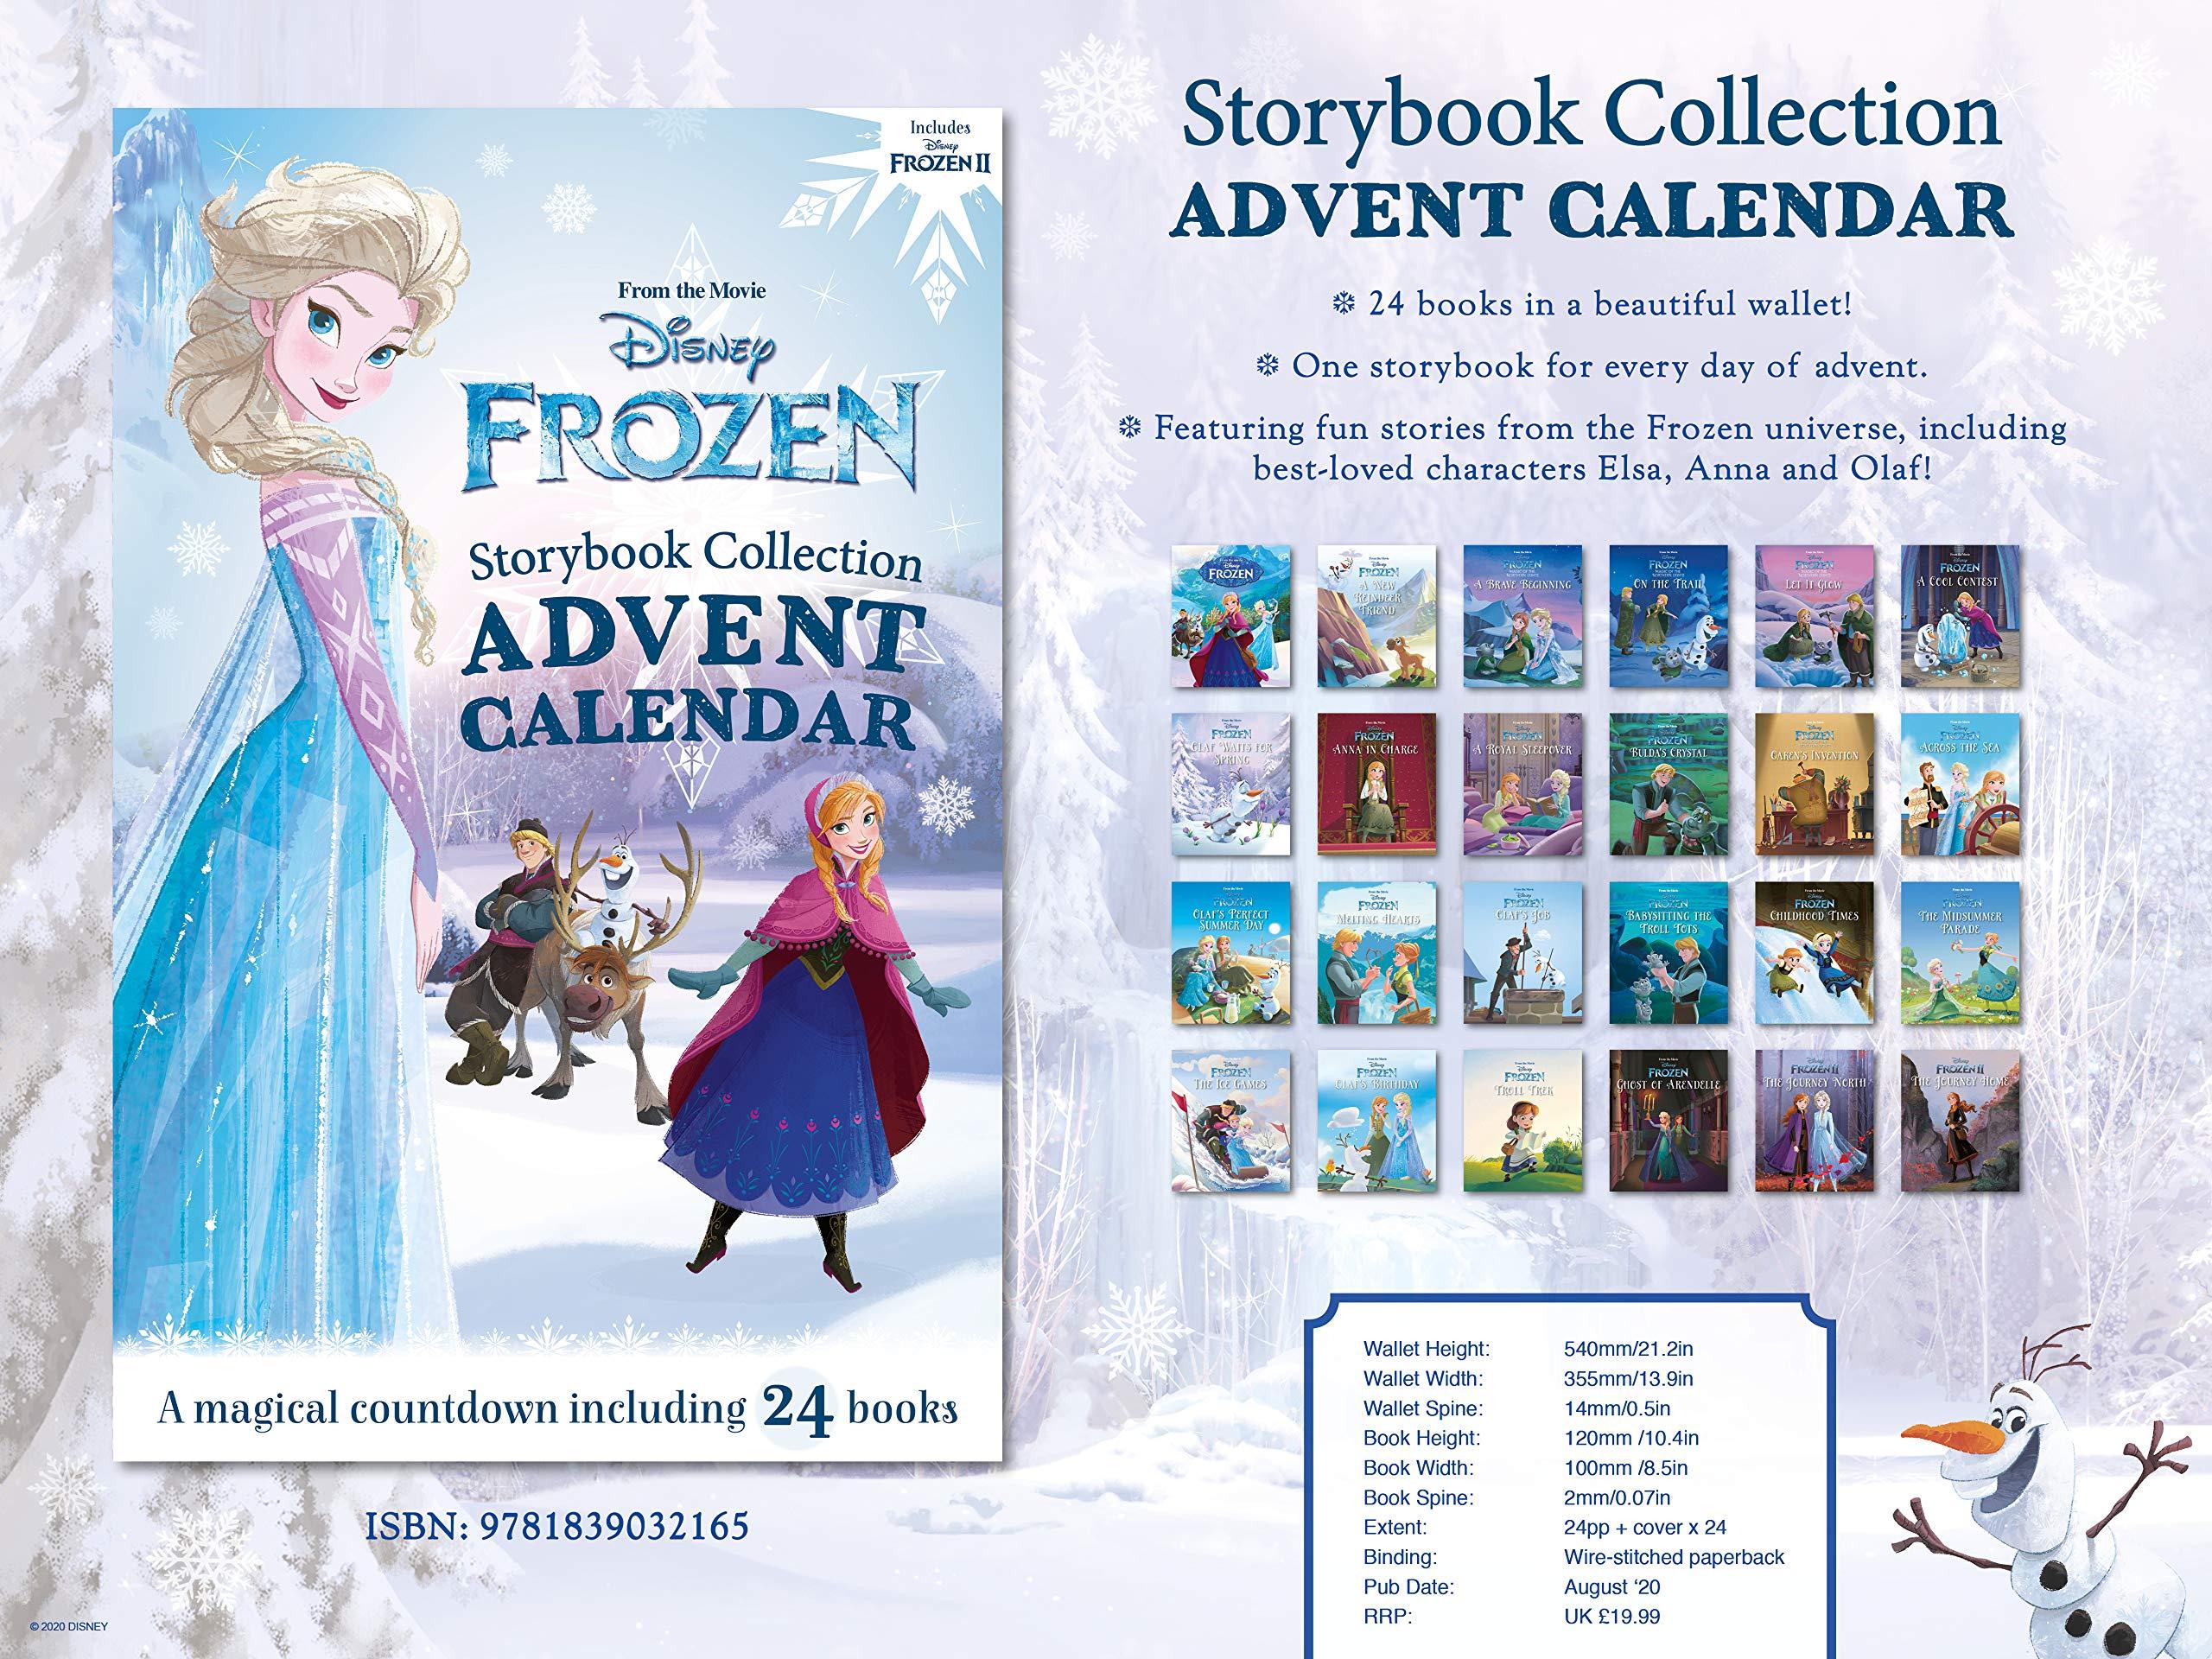 Disney Frozen Storybook Collection Advent Calendar 40% OFF £12 @ Amazon